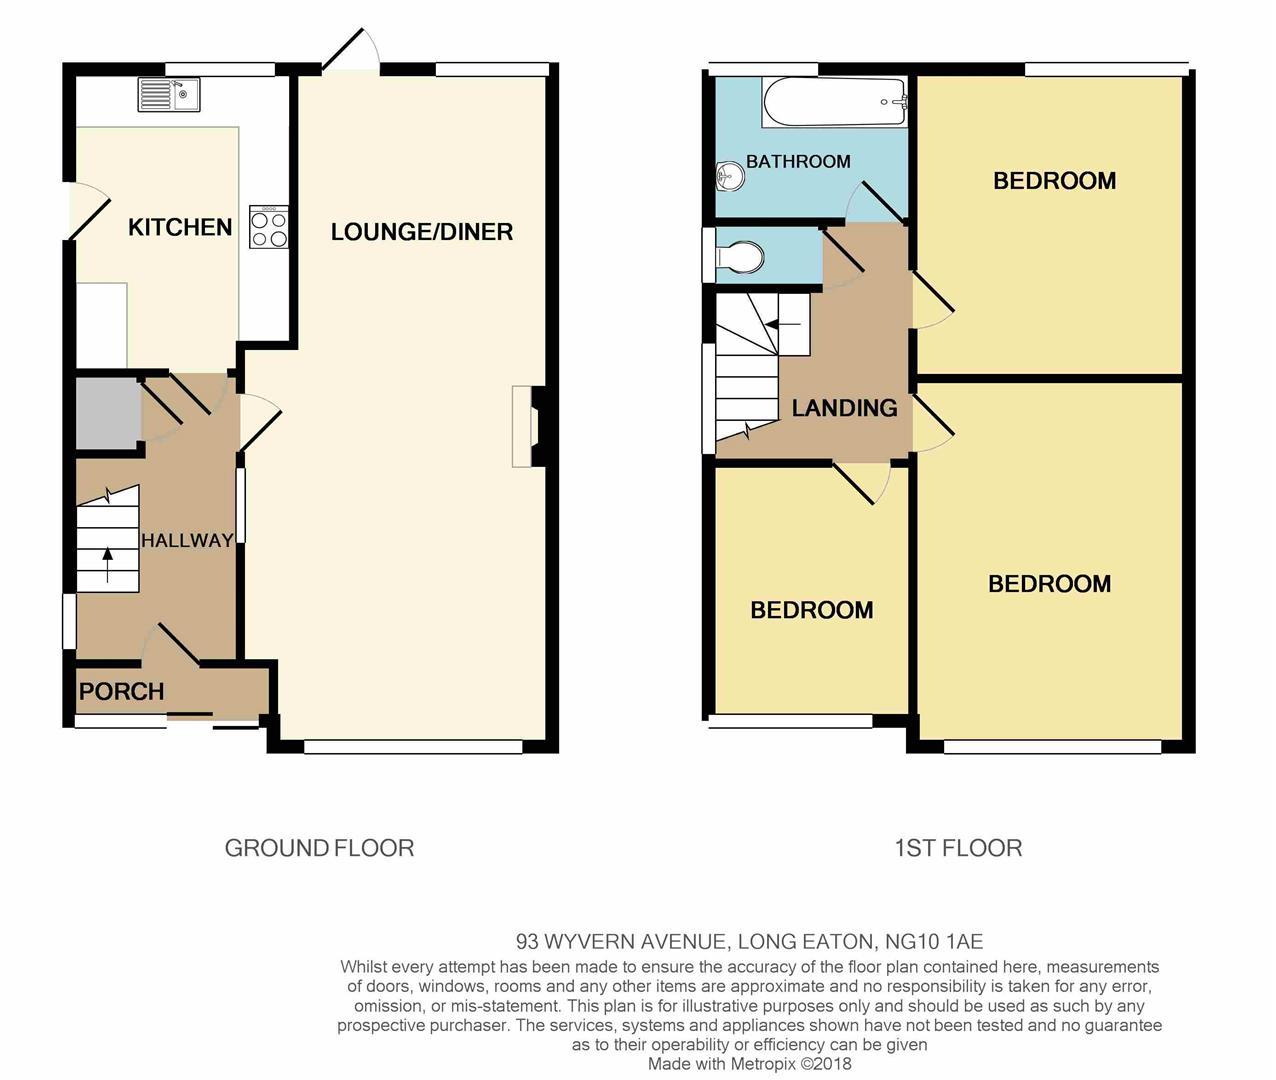 3 bed detached house for sale in wyvern avenue long eaton. Black Bedroom Furniture Sets. Home Design Ideas